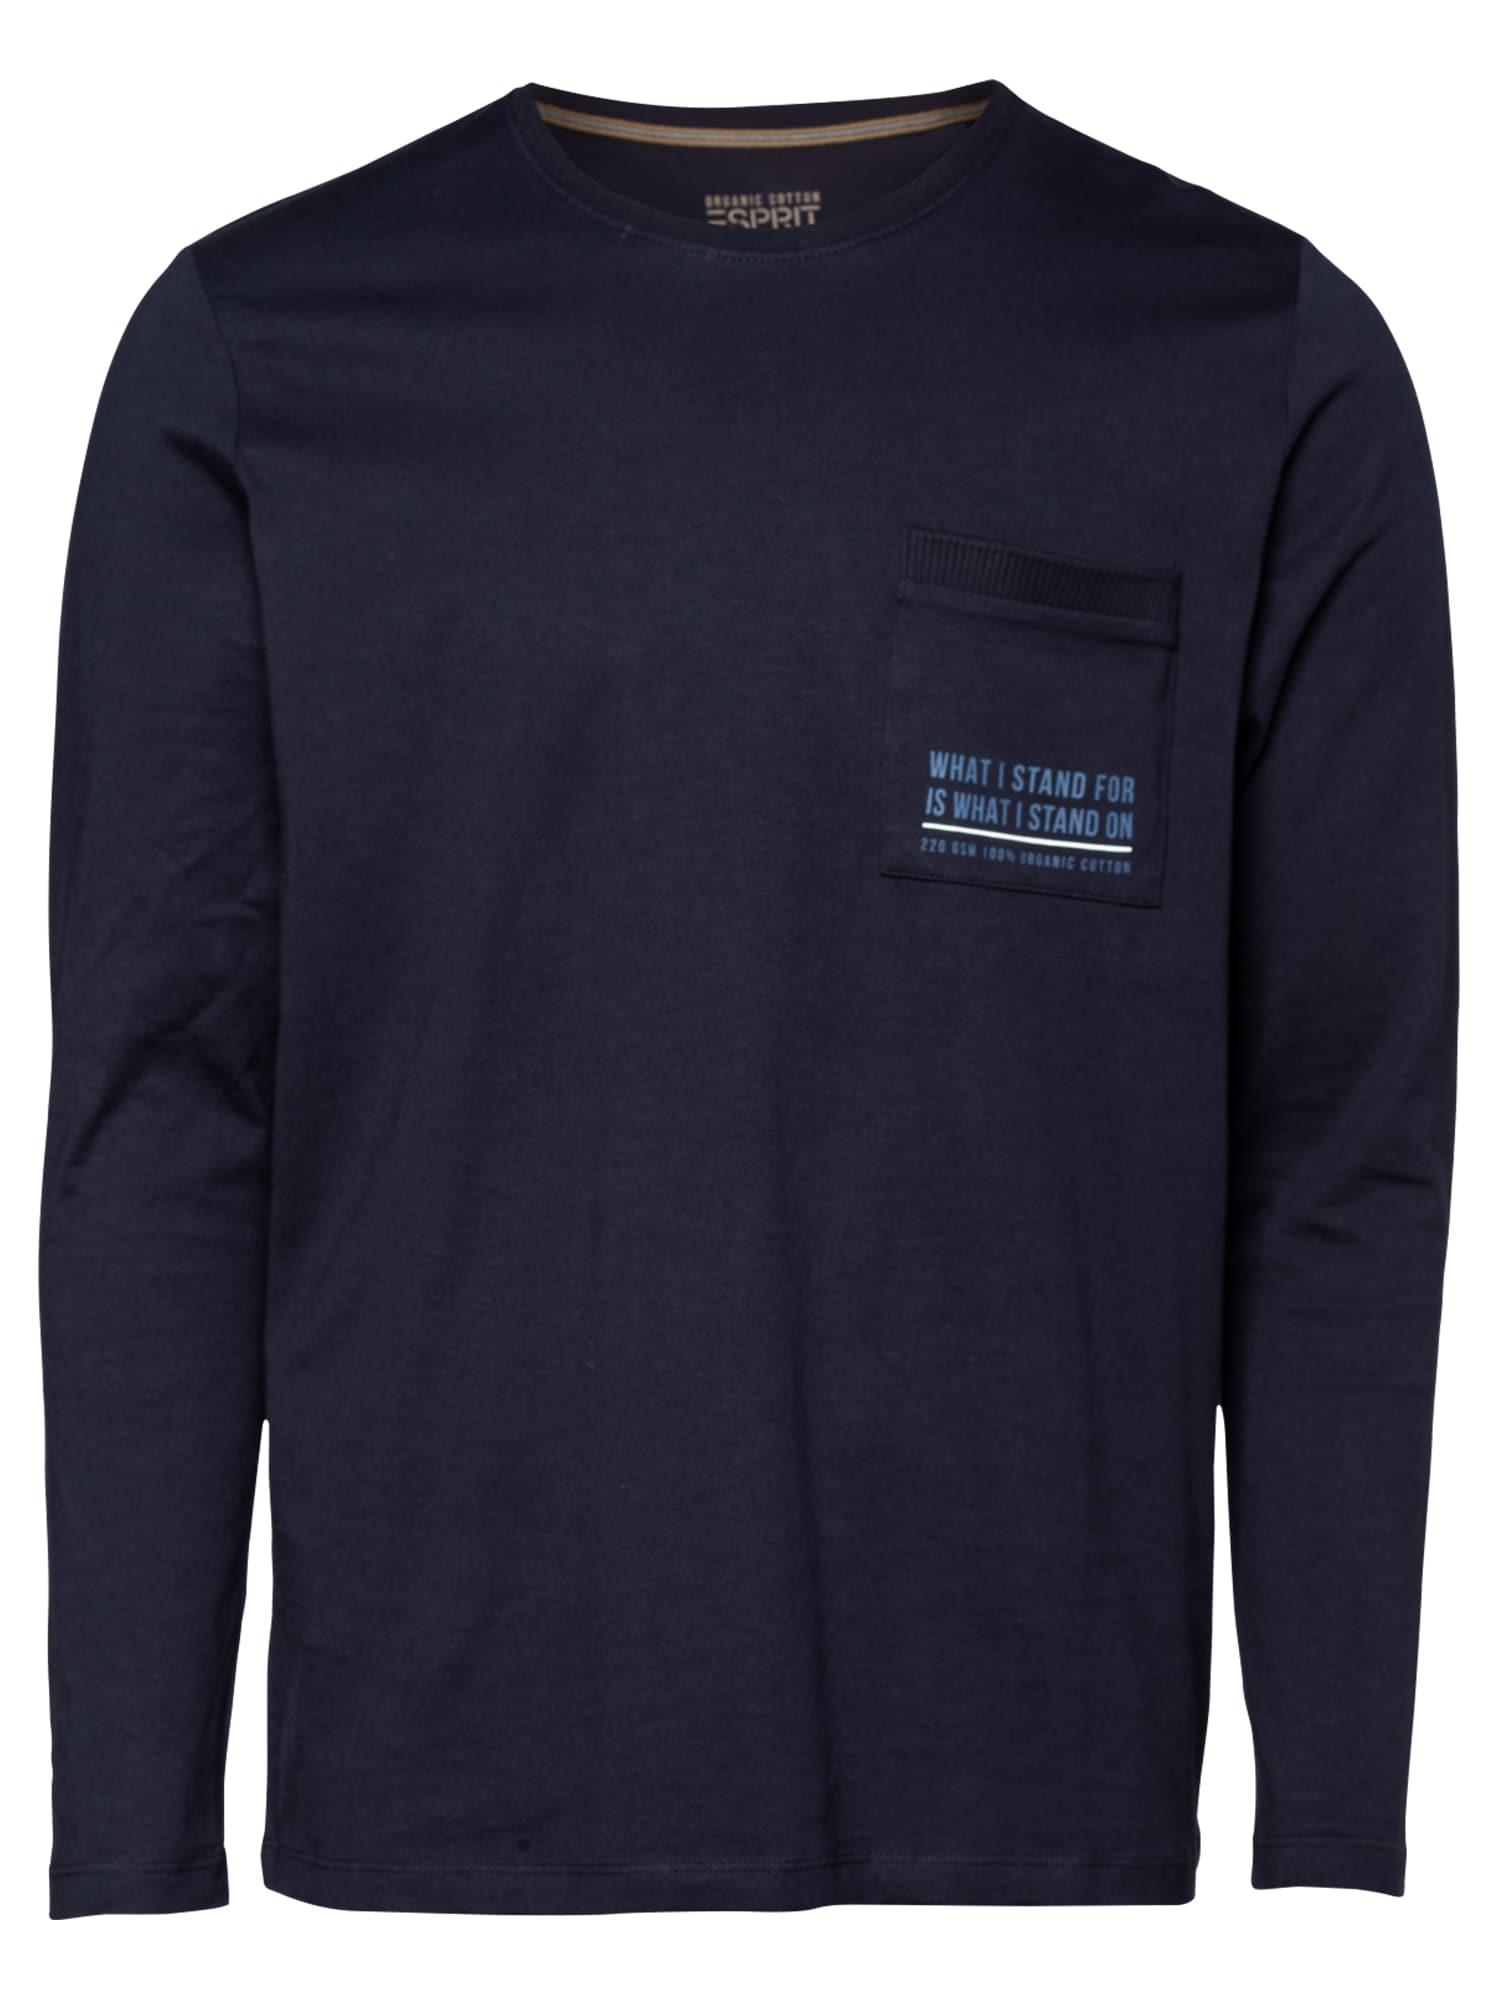 ESPRIT Marškinėliai tamsiai mėlyna / mėlyna / balta